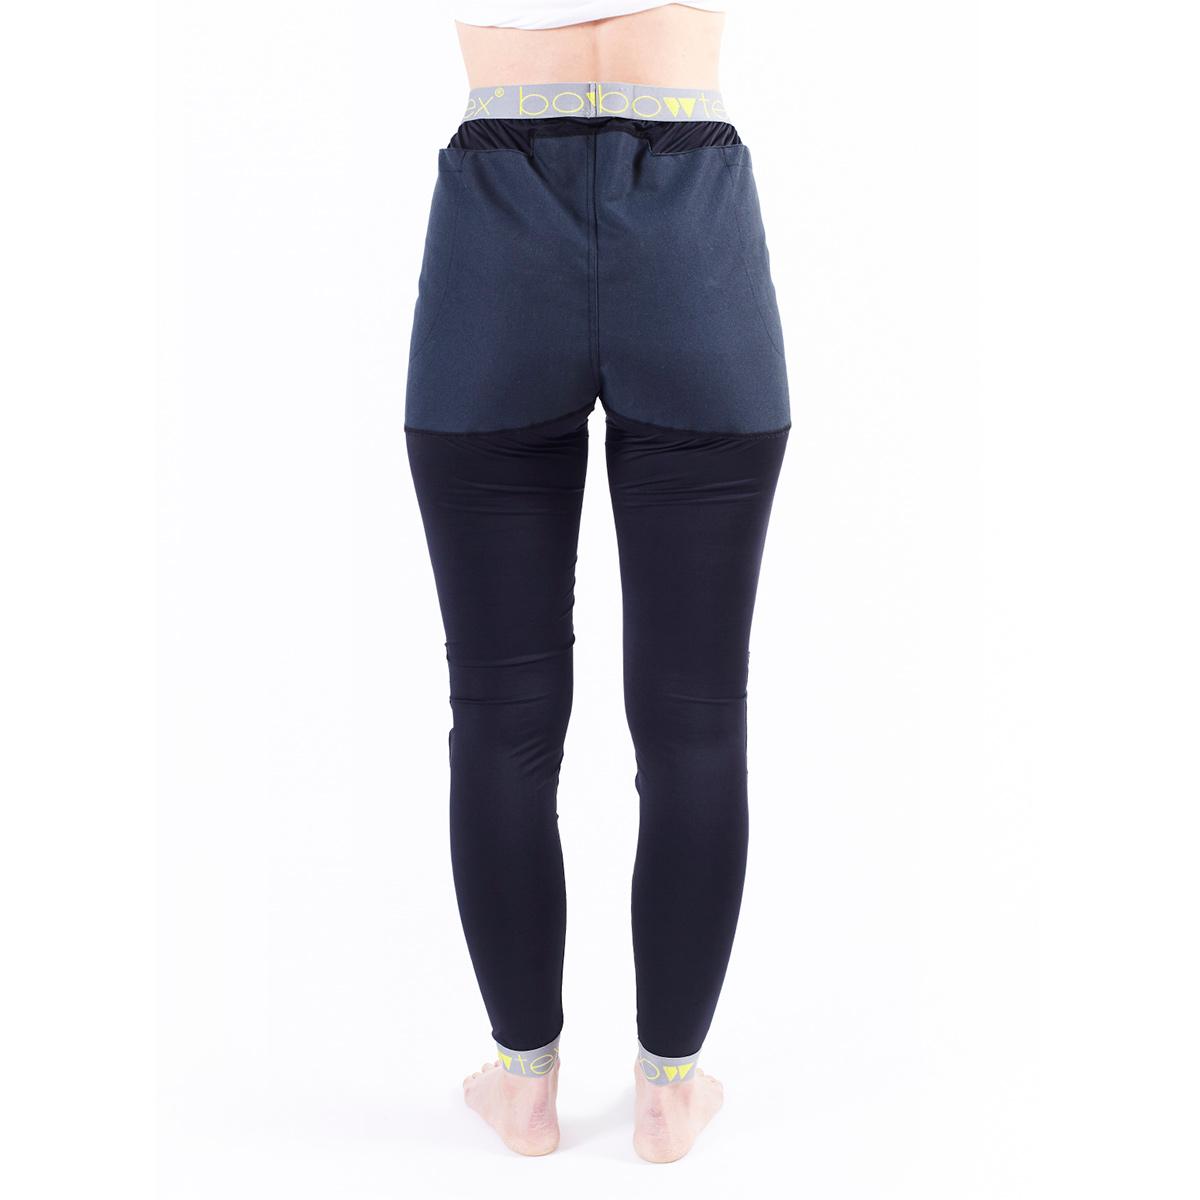 Bowtex Essential leggings - Black